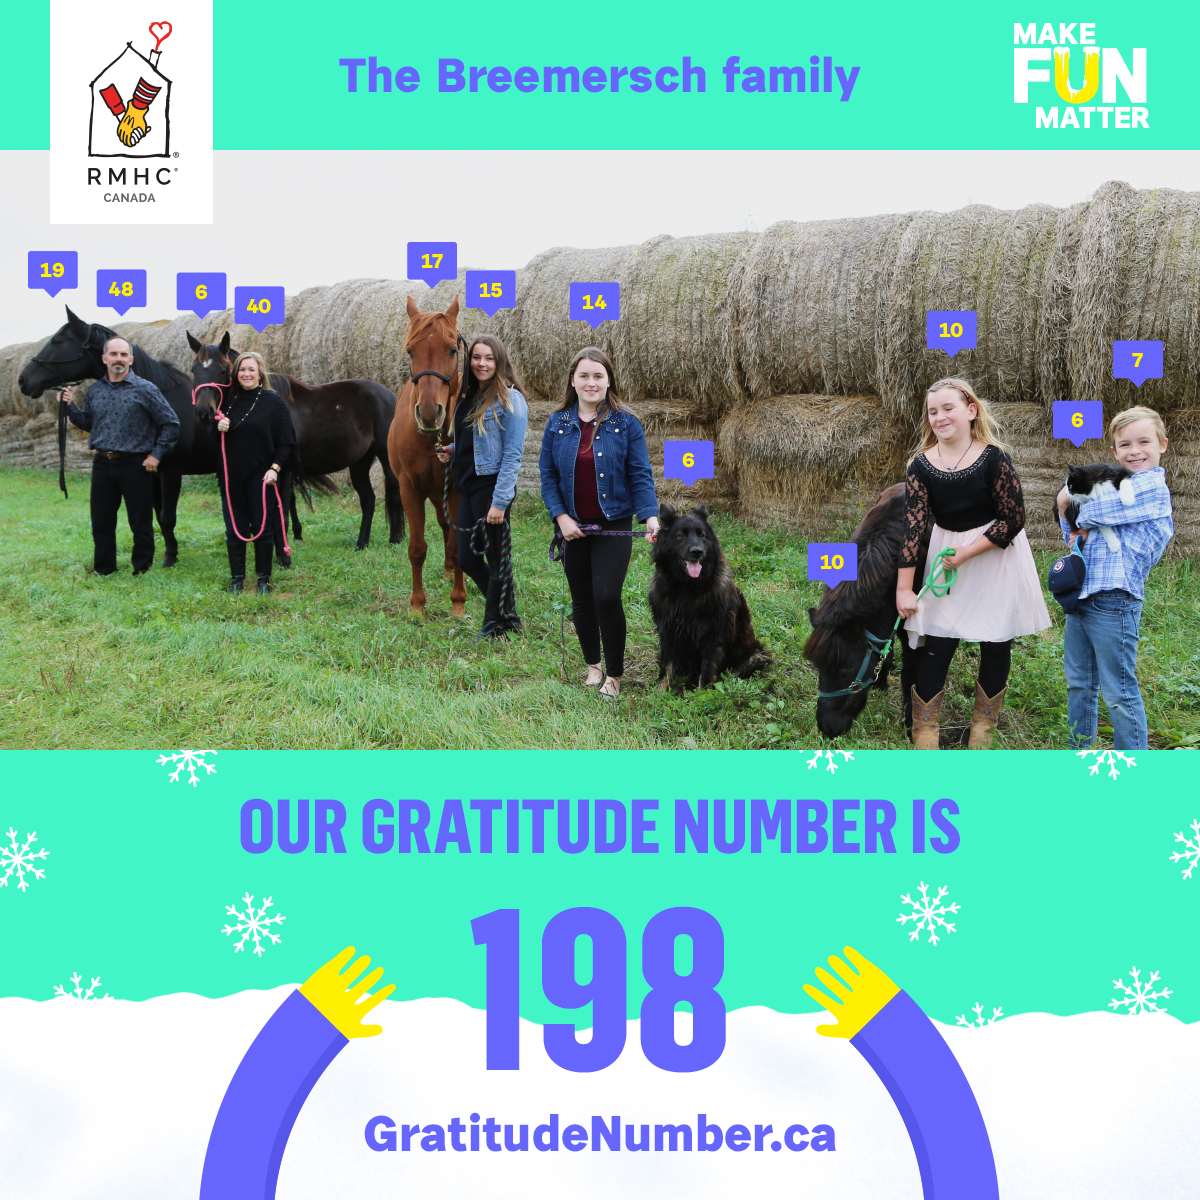 La famille Breemersch Indice de gratitude de 198.